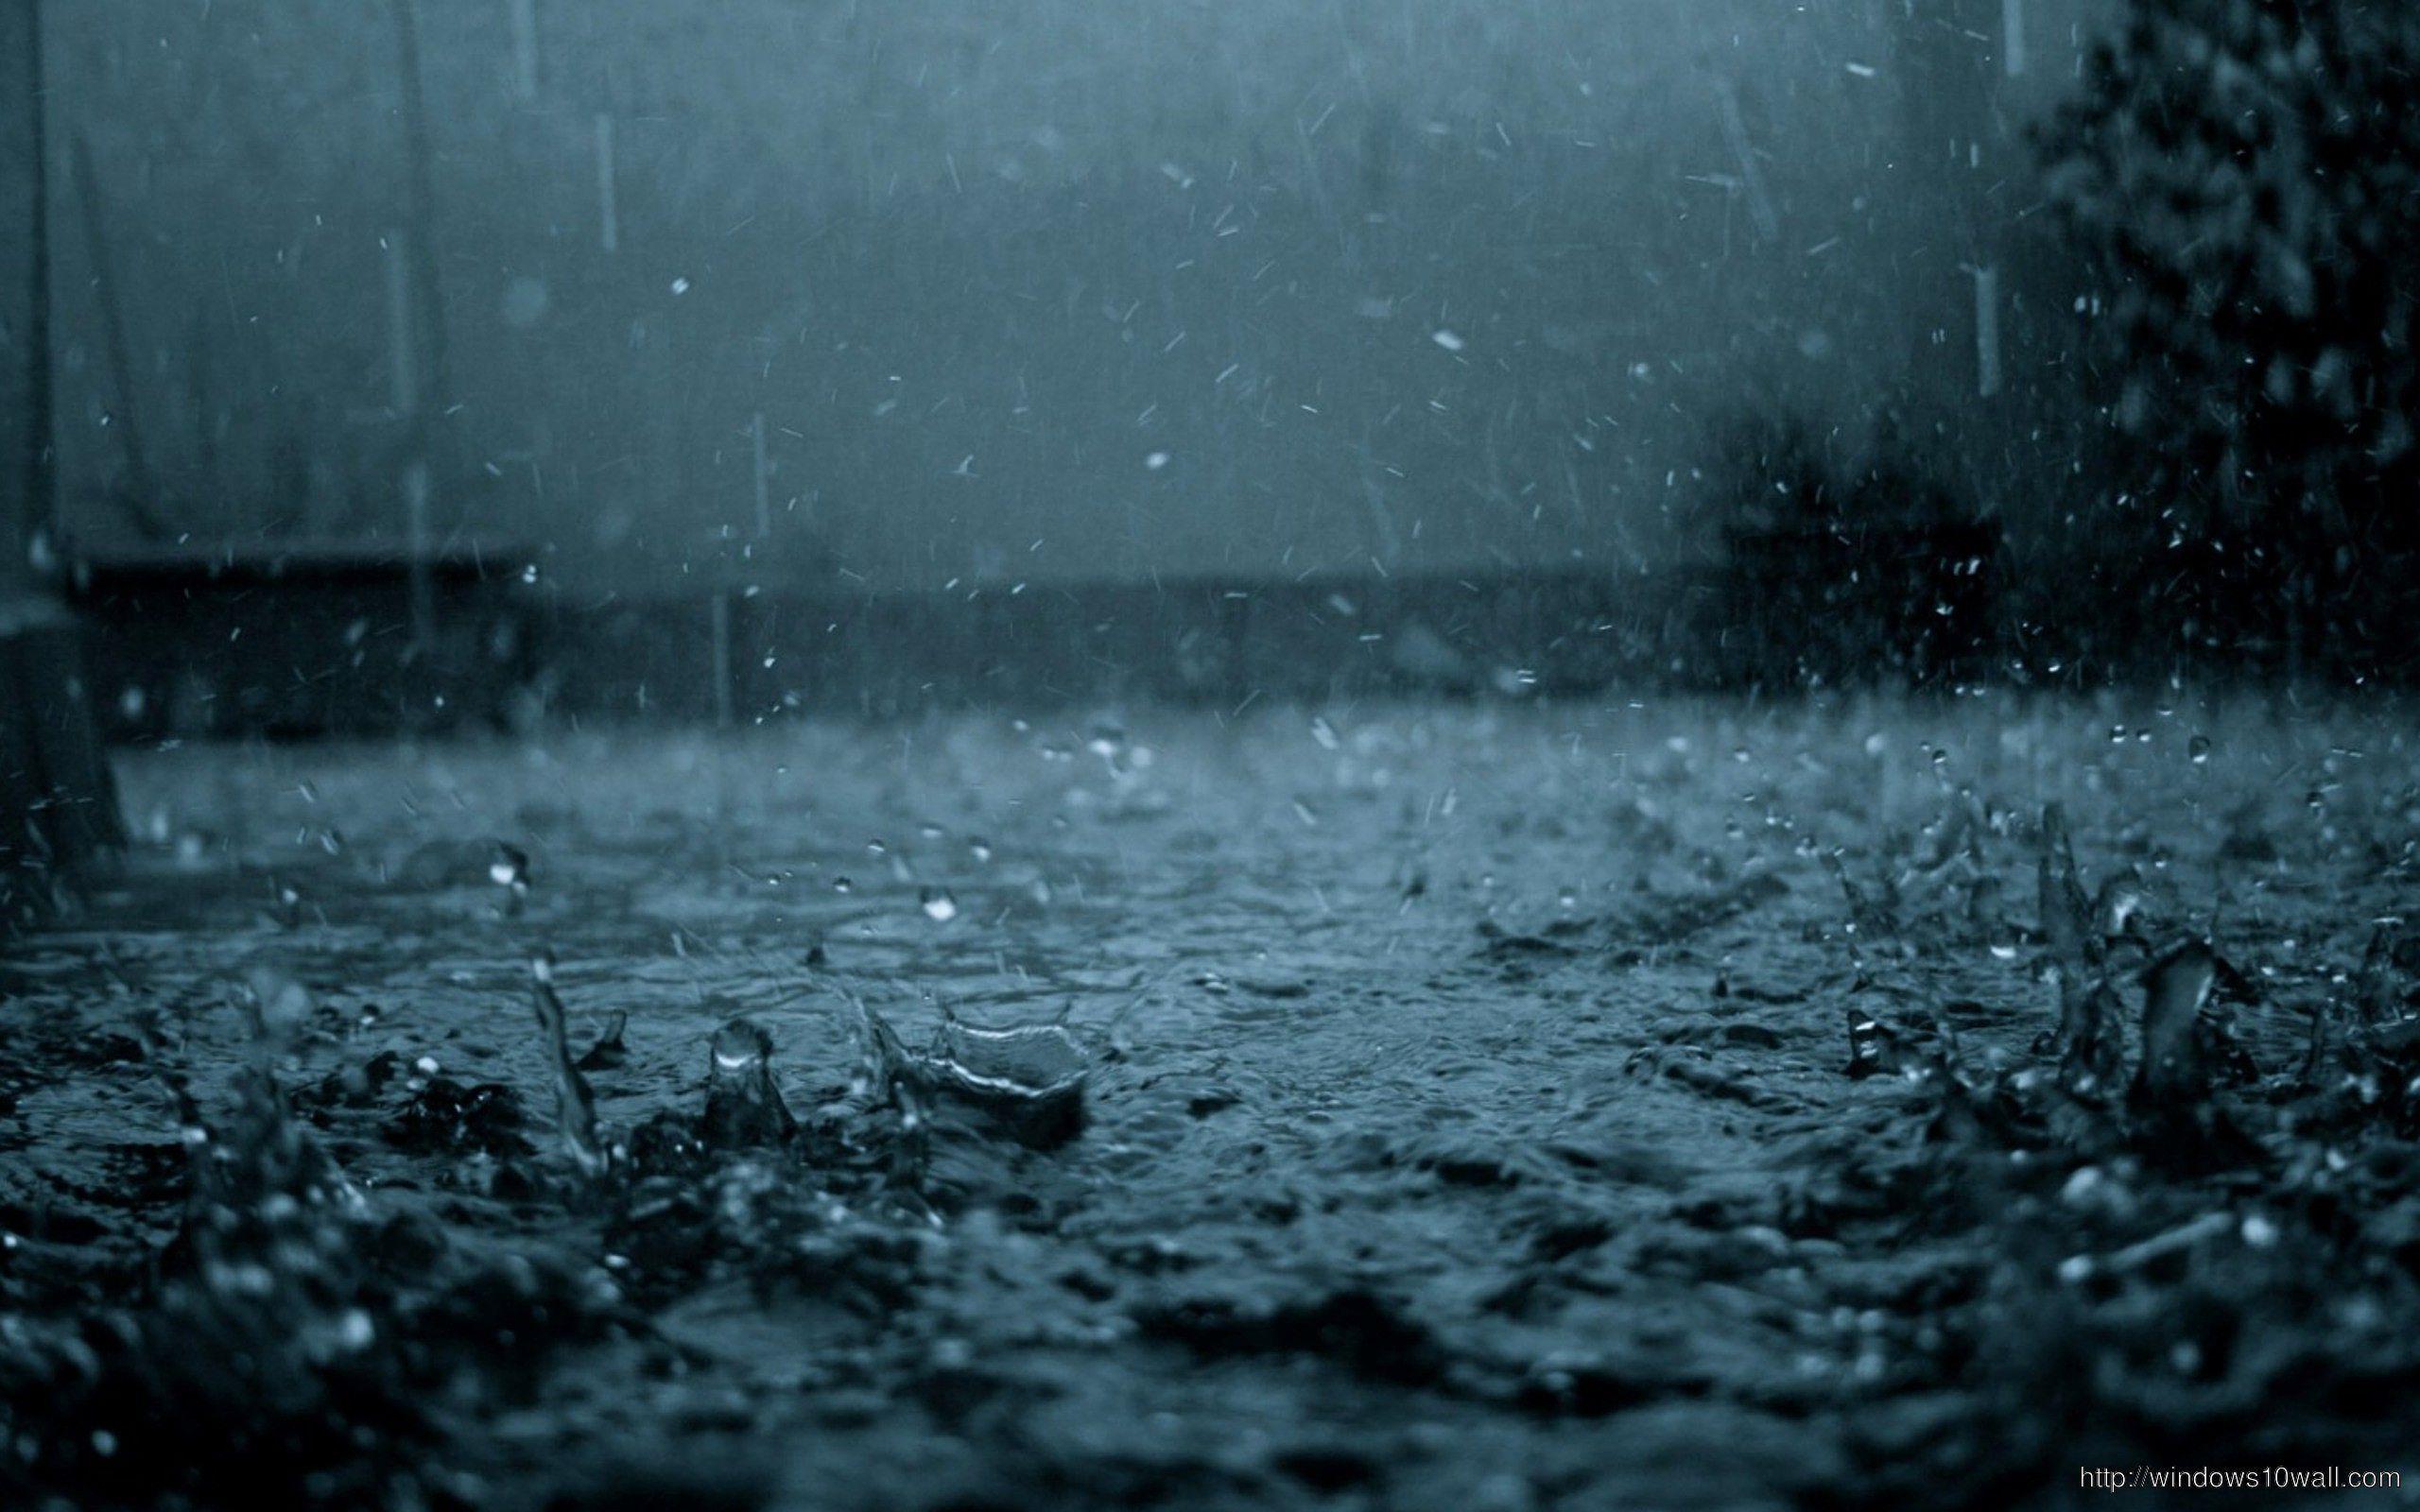 Rain Drops Hd Wallpaper Windows 10 Wallpapers